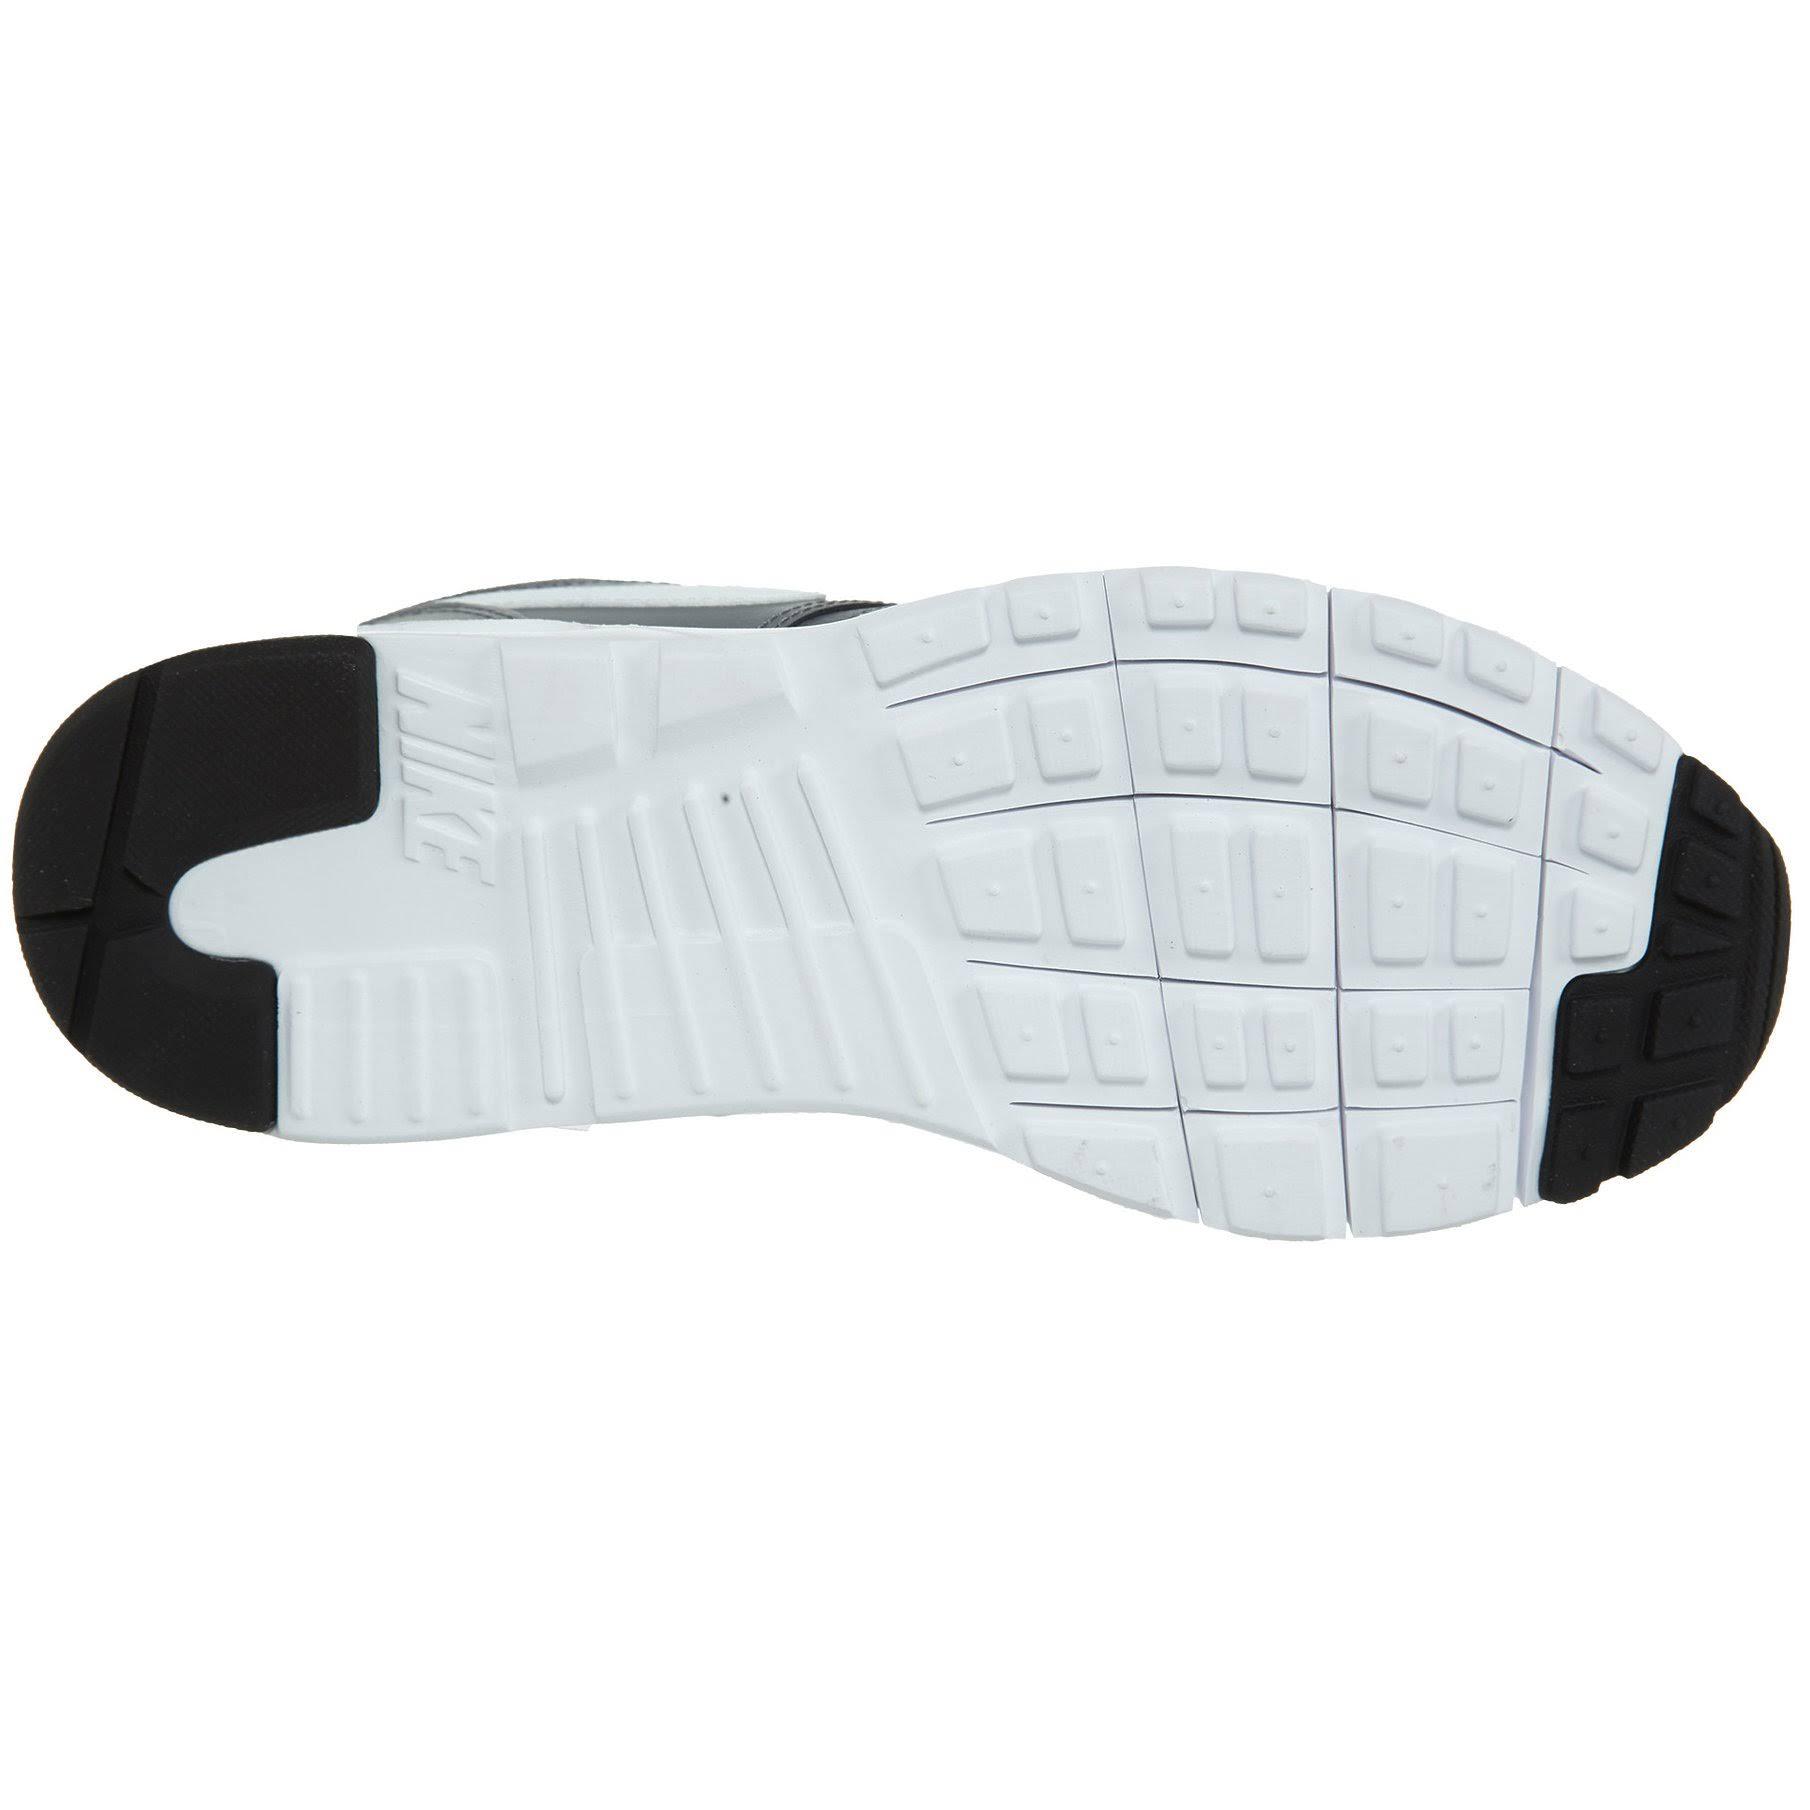 De Cool Gris negro Zapatillas Nike Vision Boys Running Air Max Blanco 0qUxqd1w